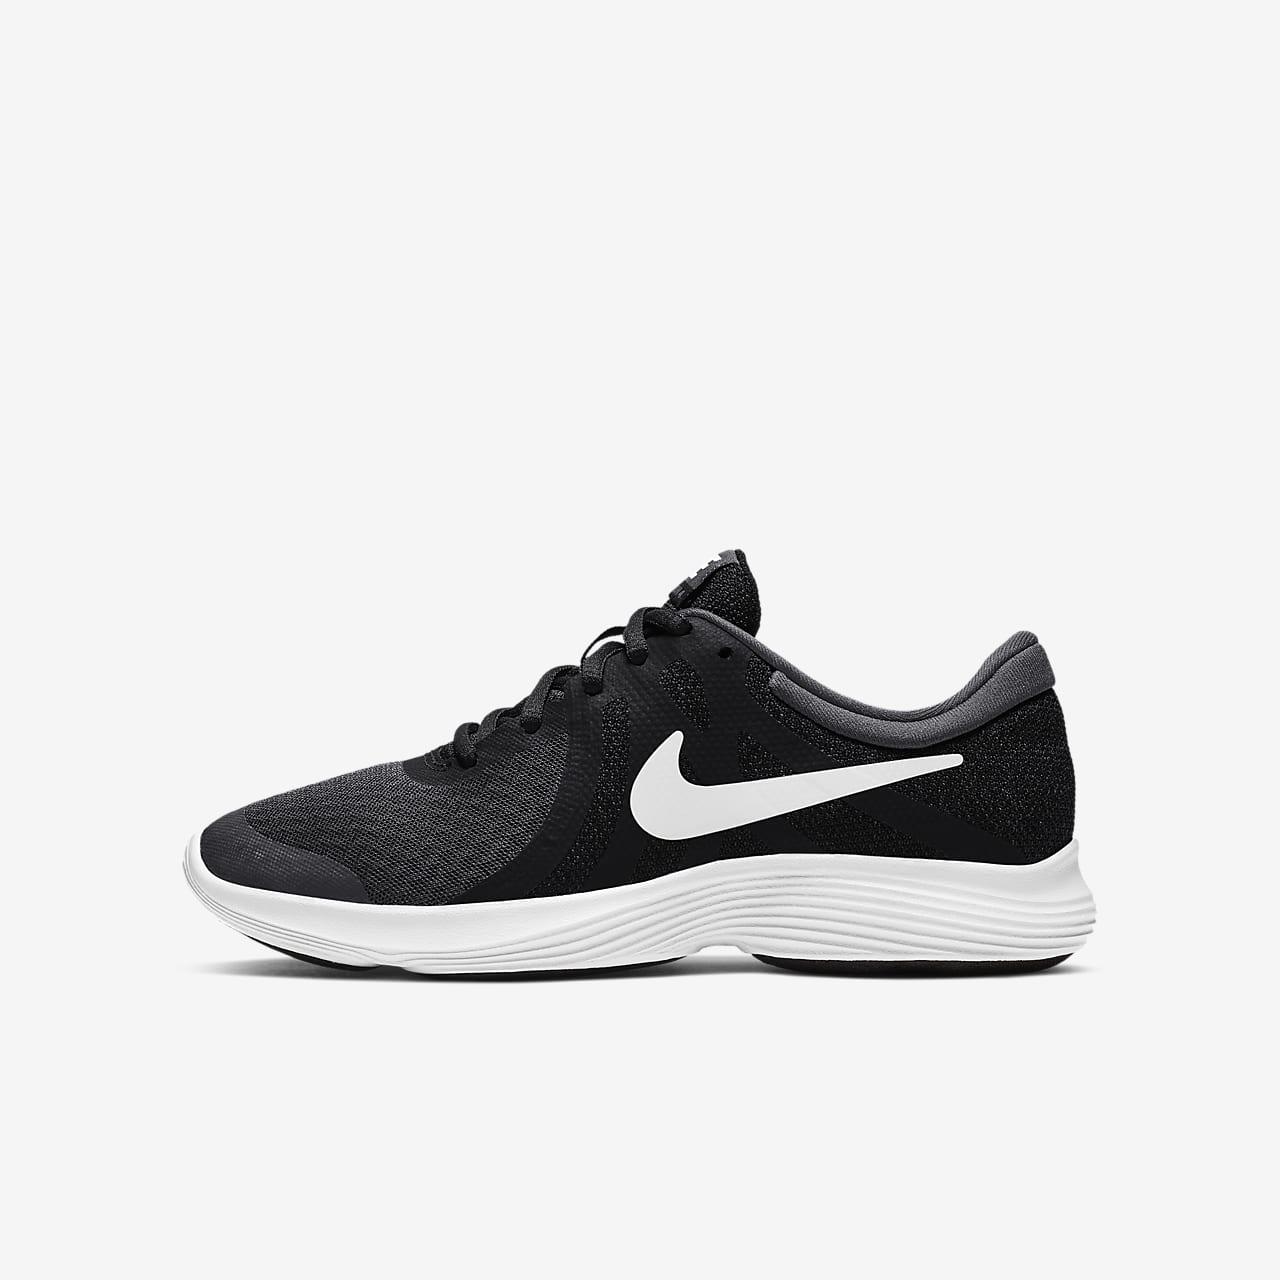 Big Kids' Running Shoe. Nike Revolution 4